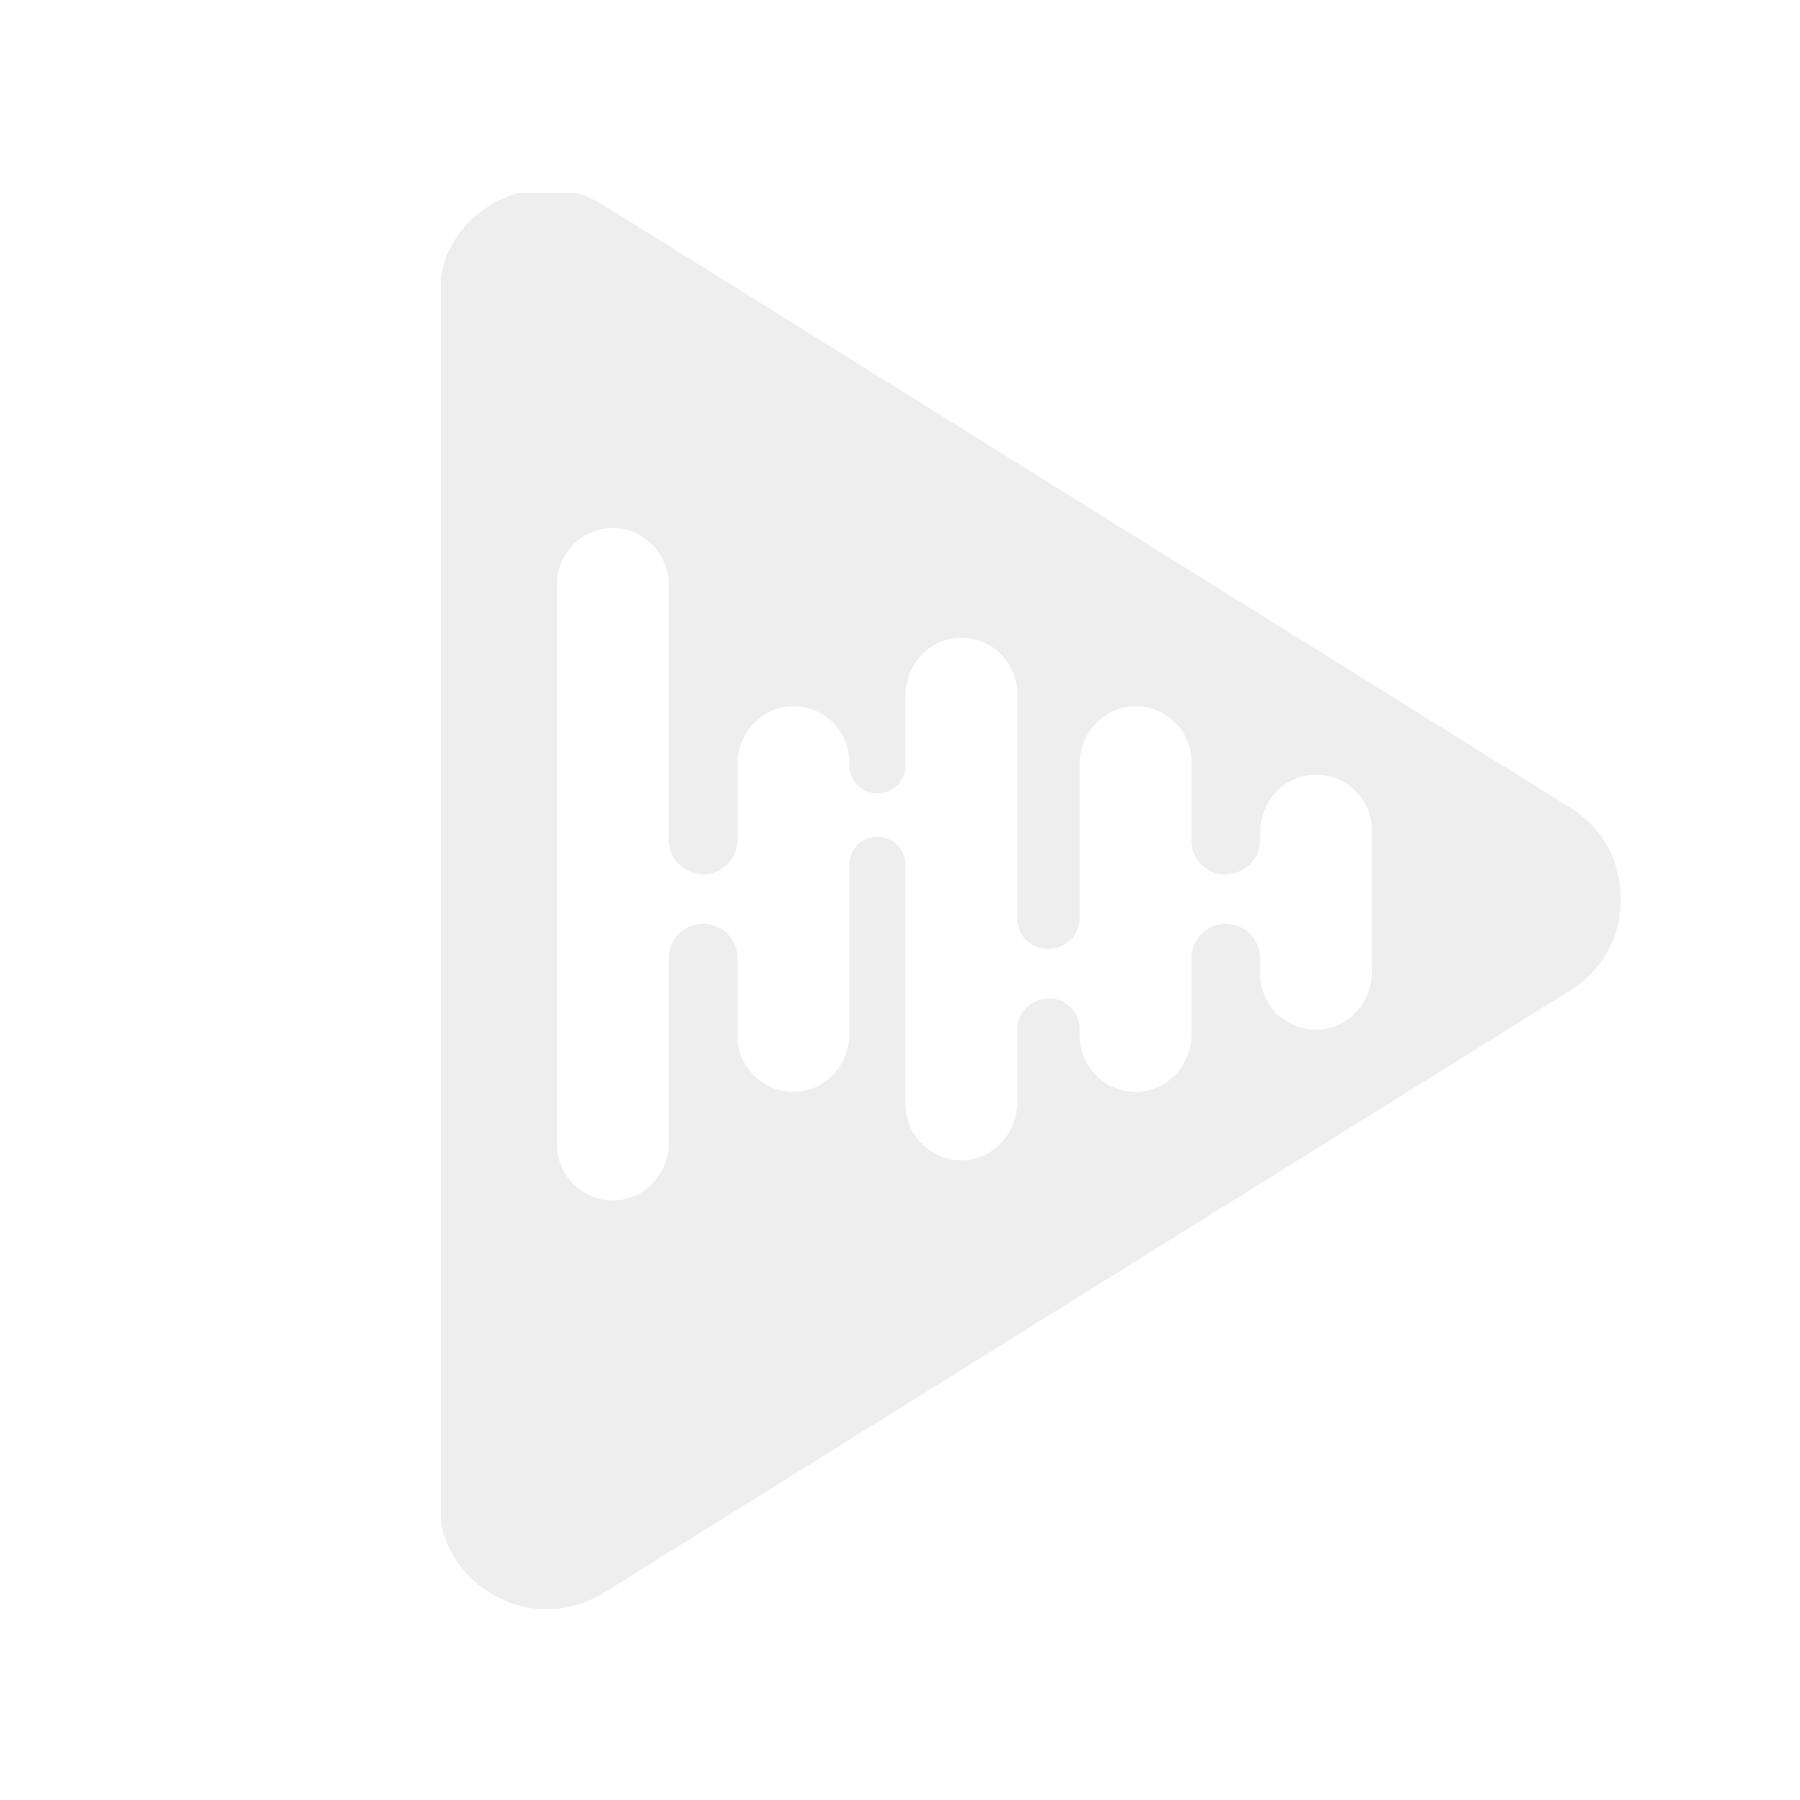 Grandview 148613 - Lerret Cyber, 16:9, 203x114, Manuelt 92